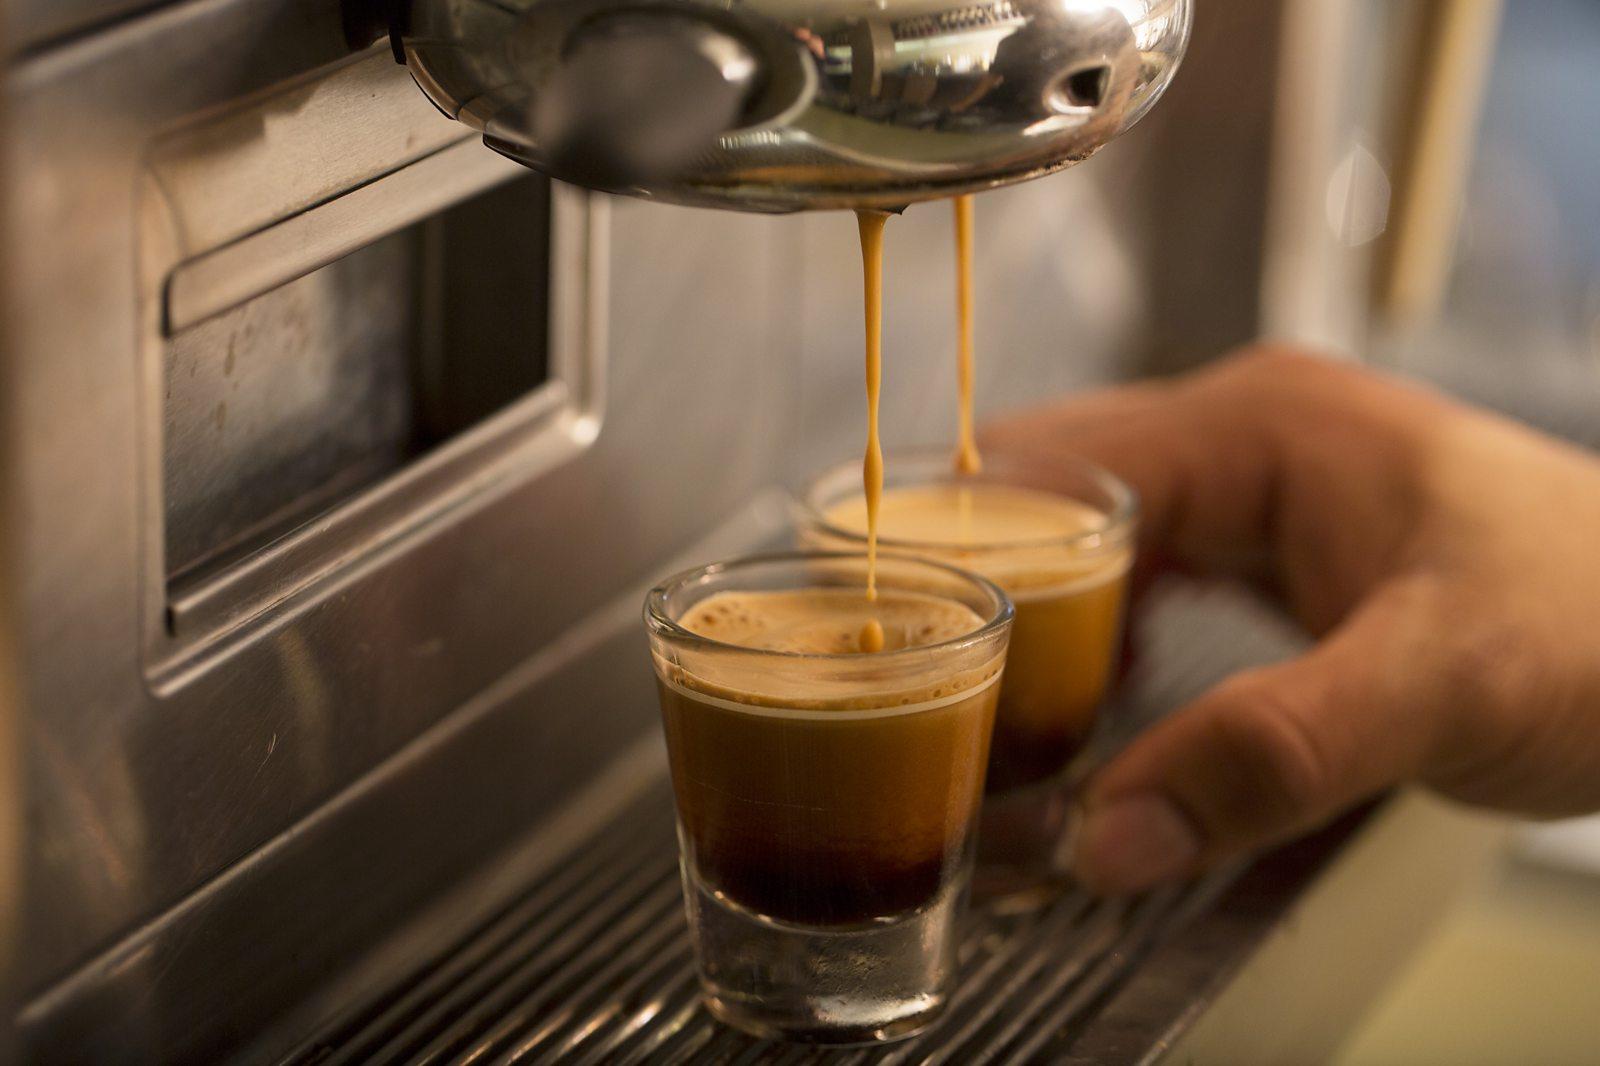 BBC iWonder - Does caffeine really make me more alert?